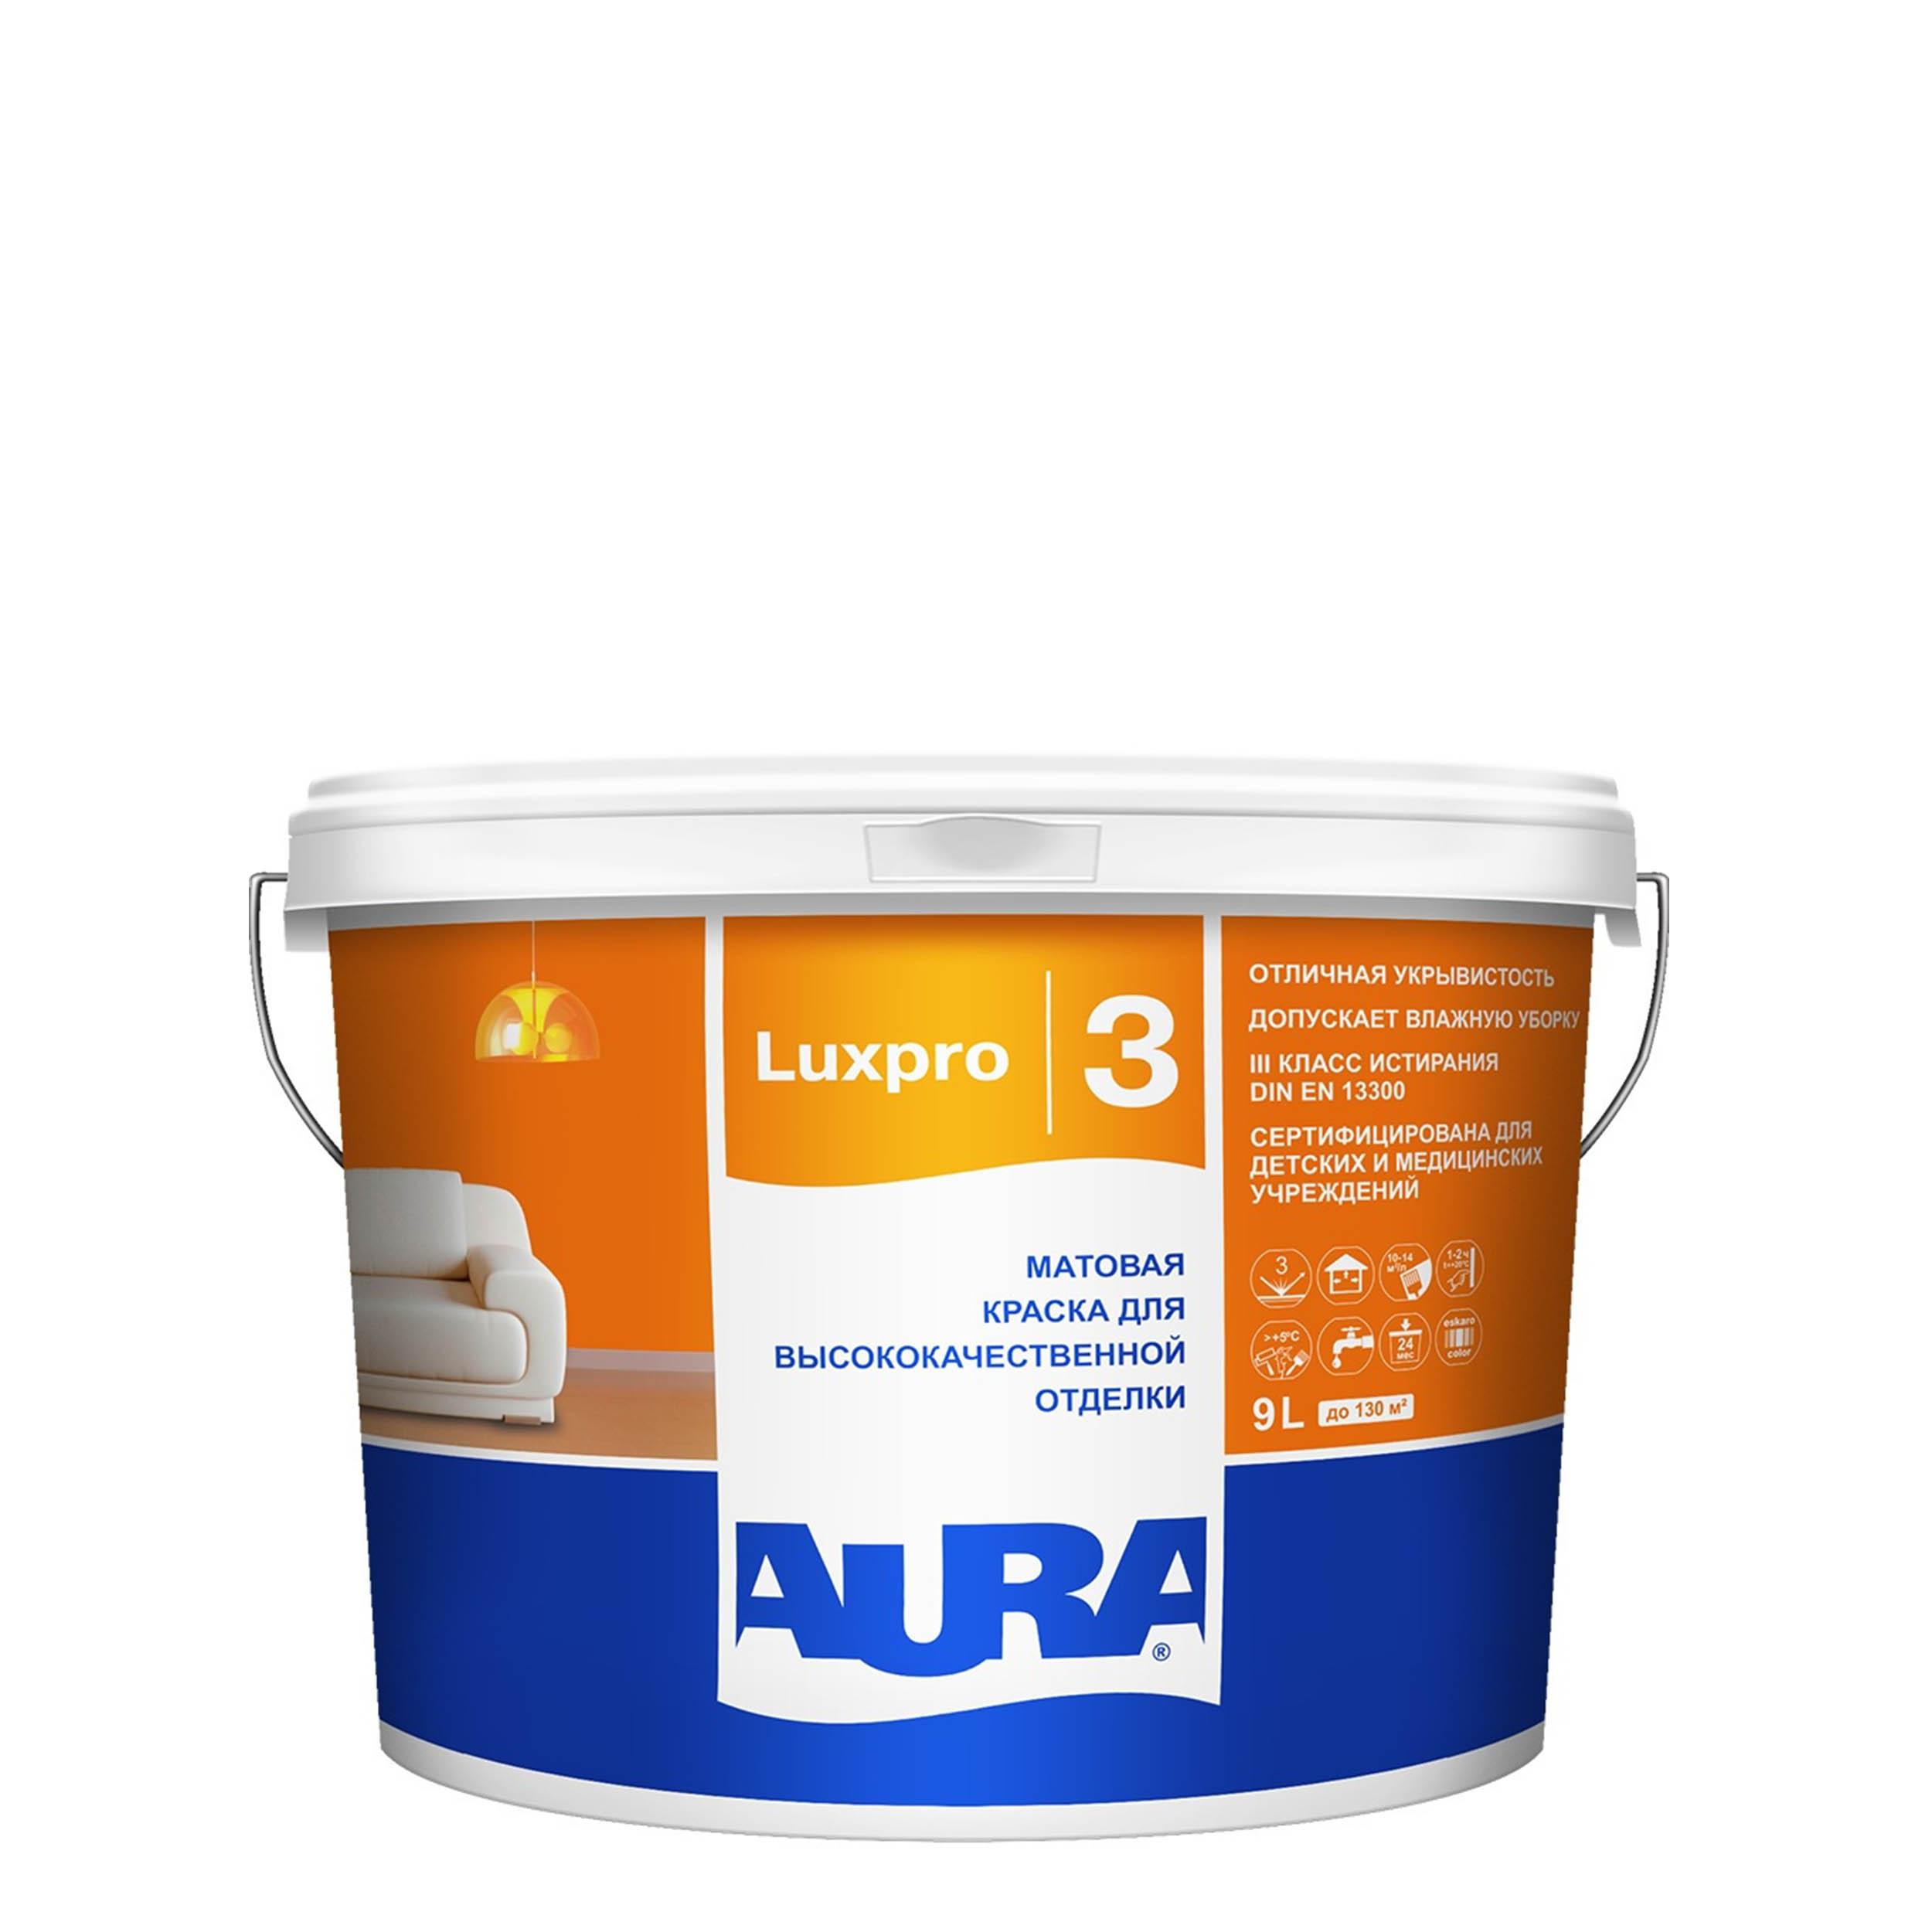 Фото 4 - Краска интерьерная, Aura LuxPRO 3, RAL 7015, 11 кг.